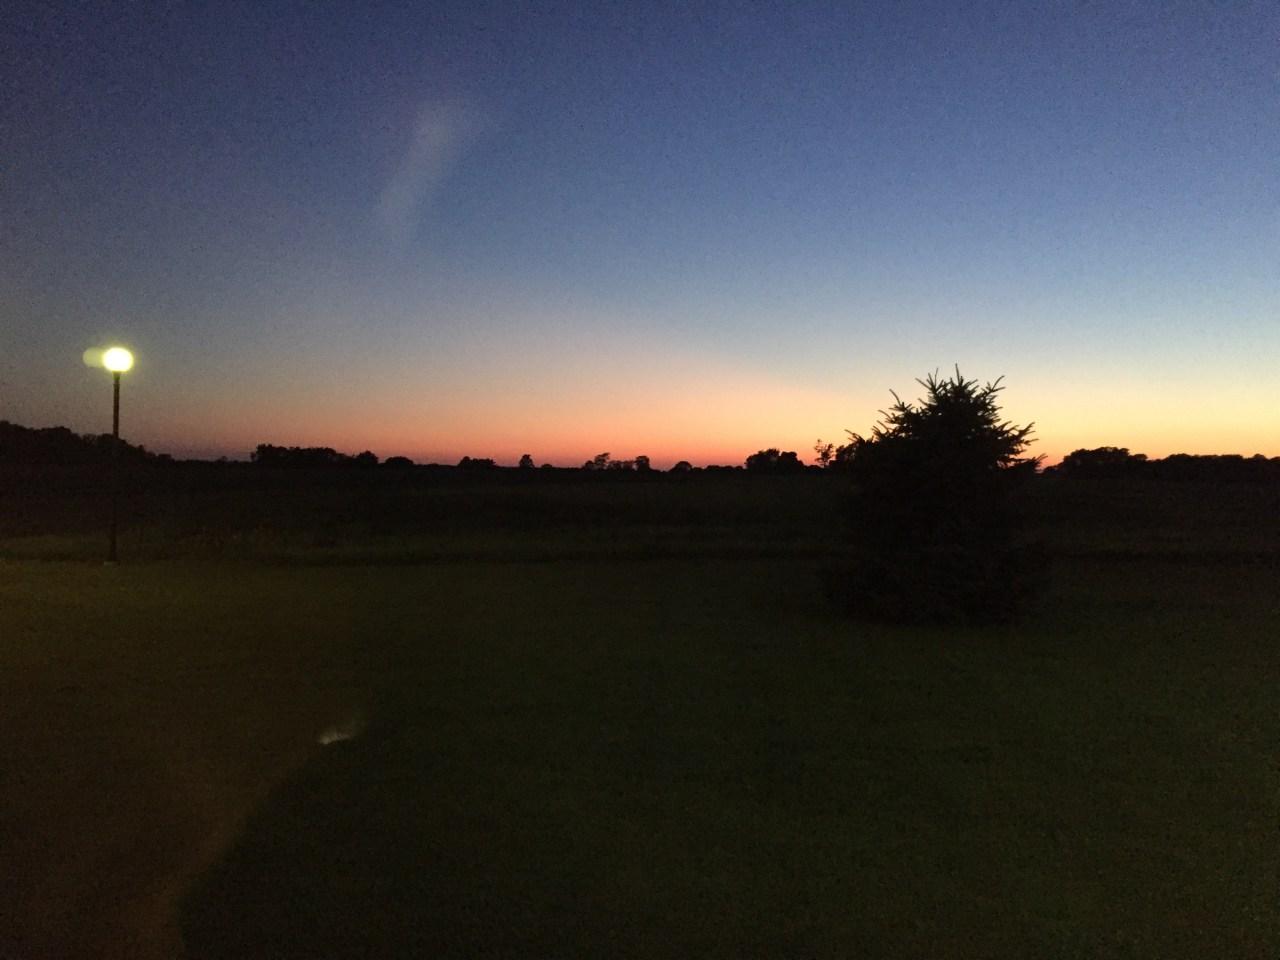 Montpelier Ohio at sunset